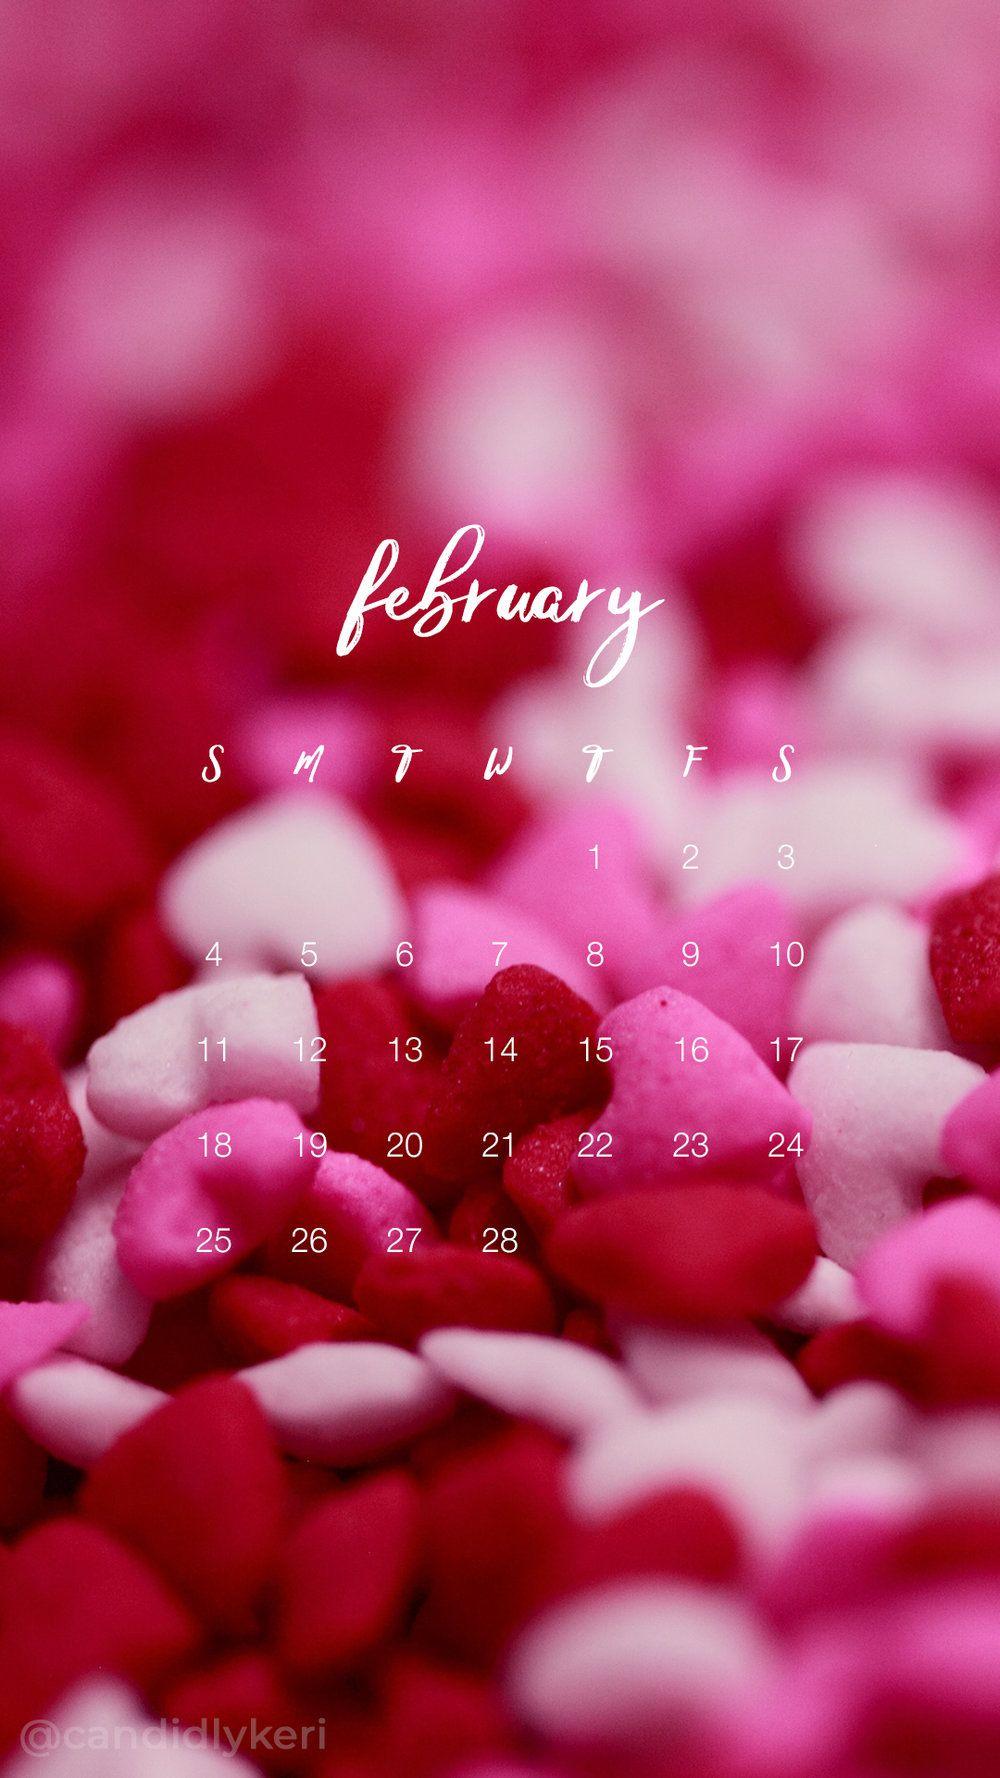 valentines wallpaper wallpaper hd aesthetic